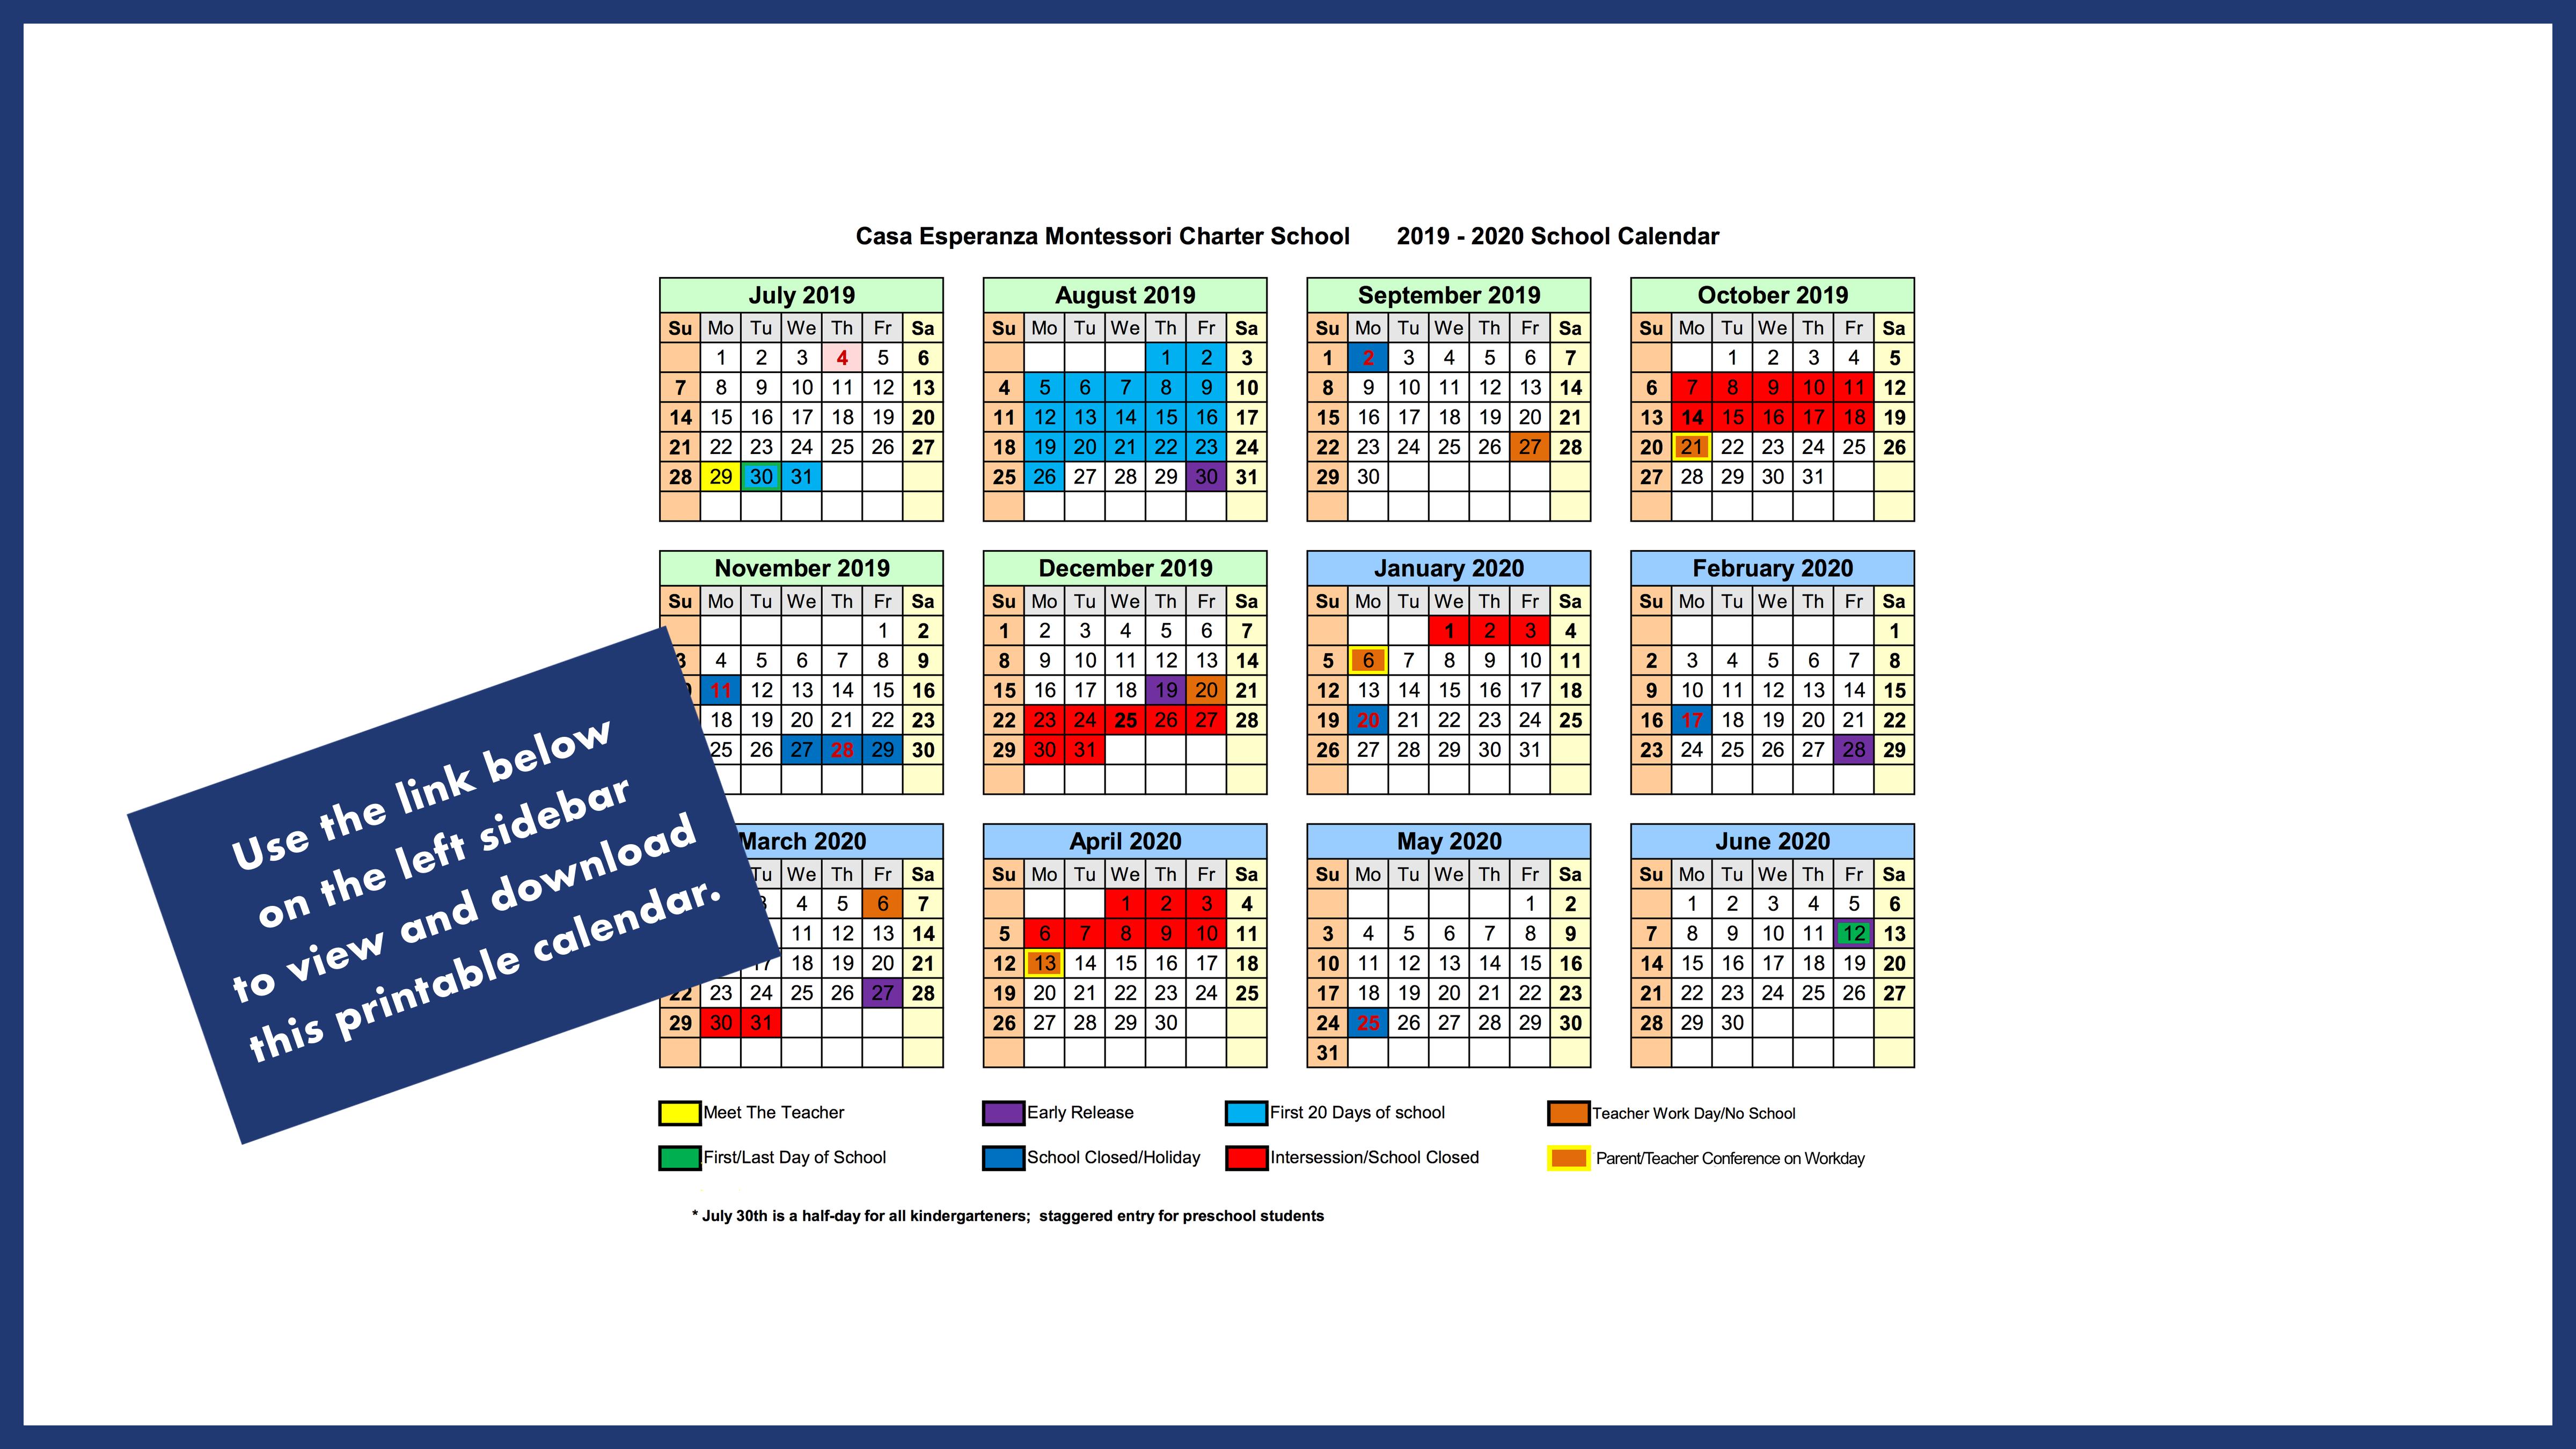 Calendar – Casa Esperanza Montessori Intended For Durham Public Schools Traditional Calendar 2021 2020